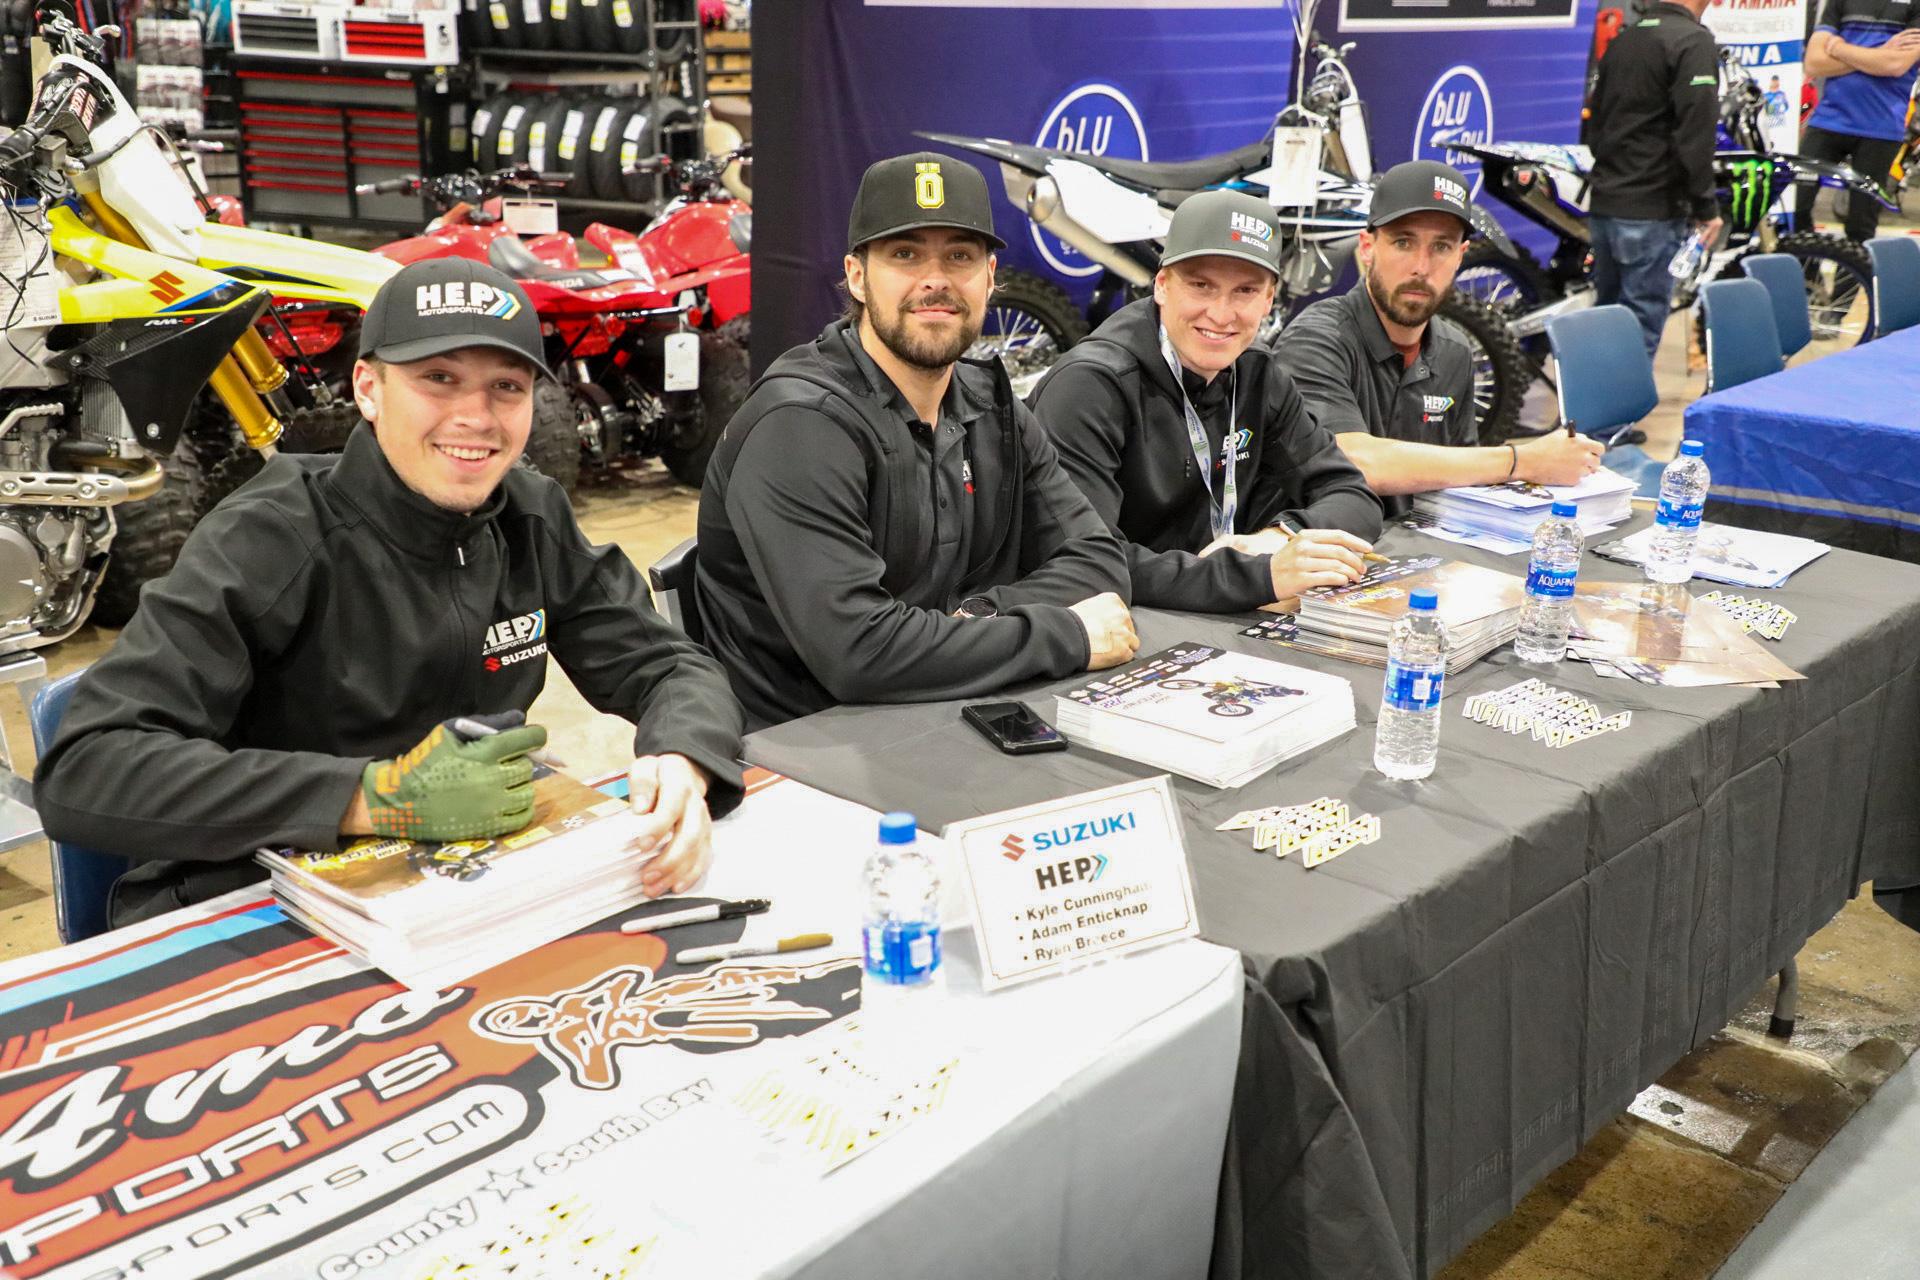 H.E.P. Motorsports Ryan Breece Steps Up in Anaheim